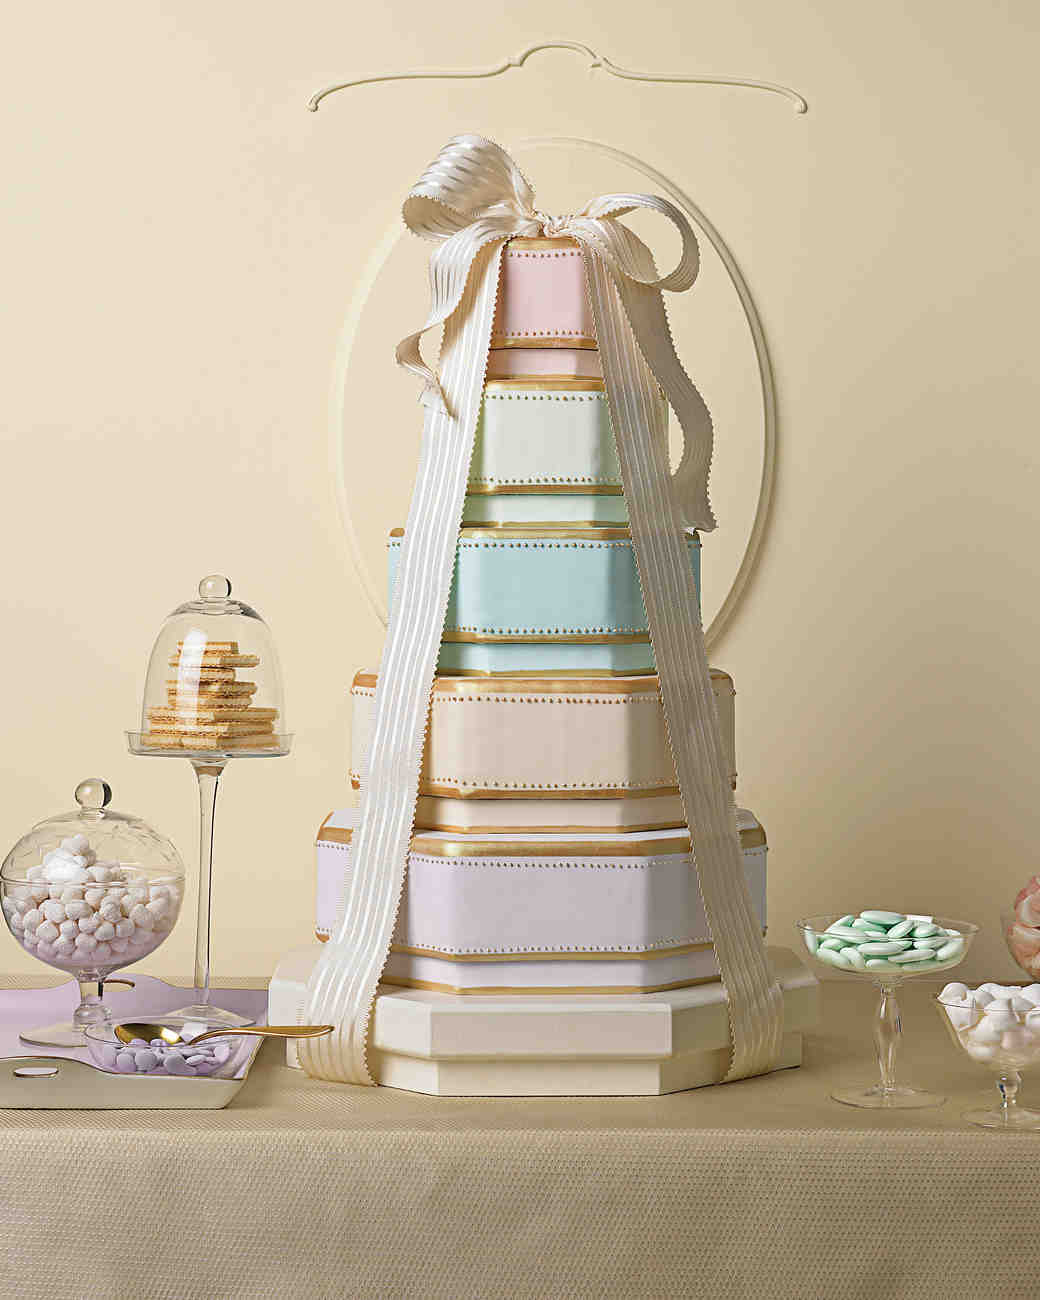 bow-cakes-mwd102811b-box-0515.jpg